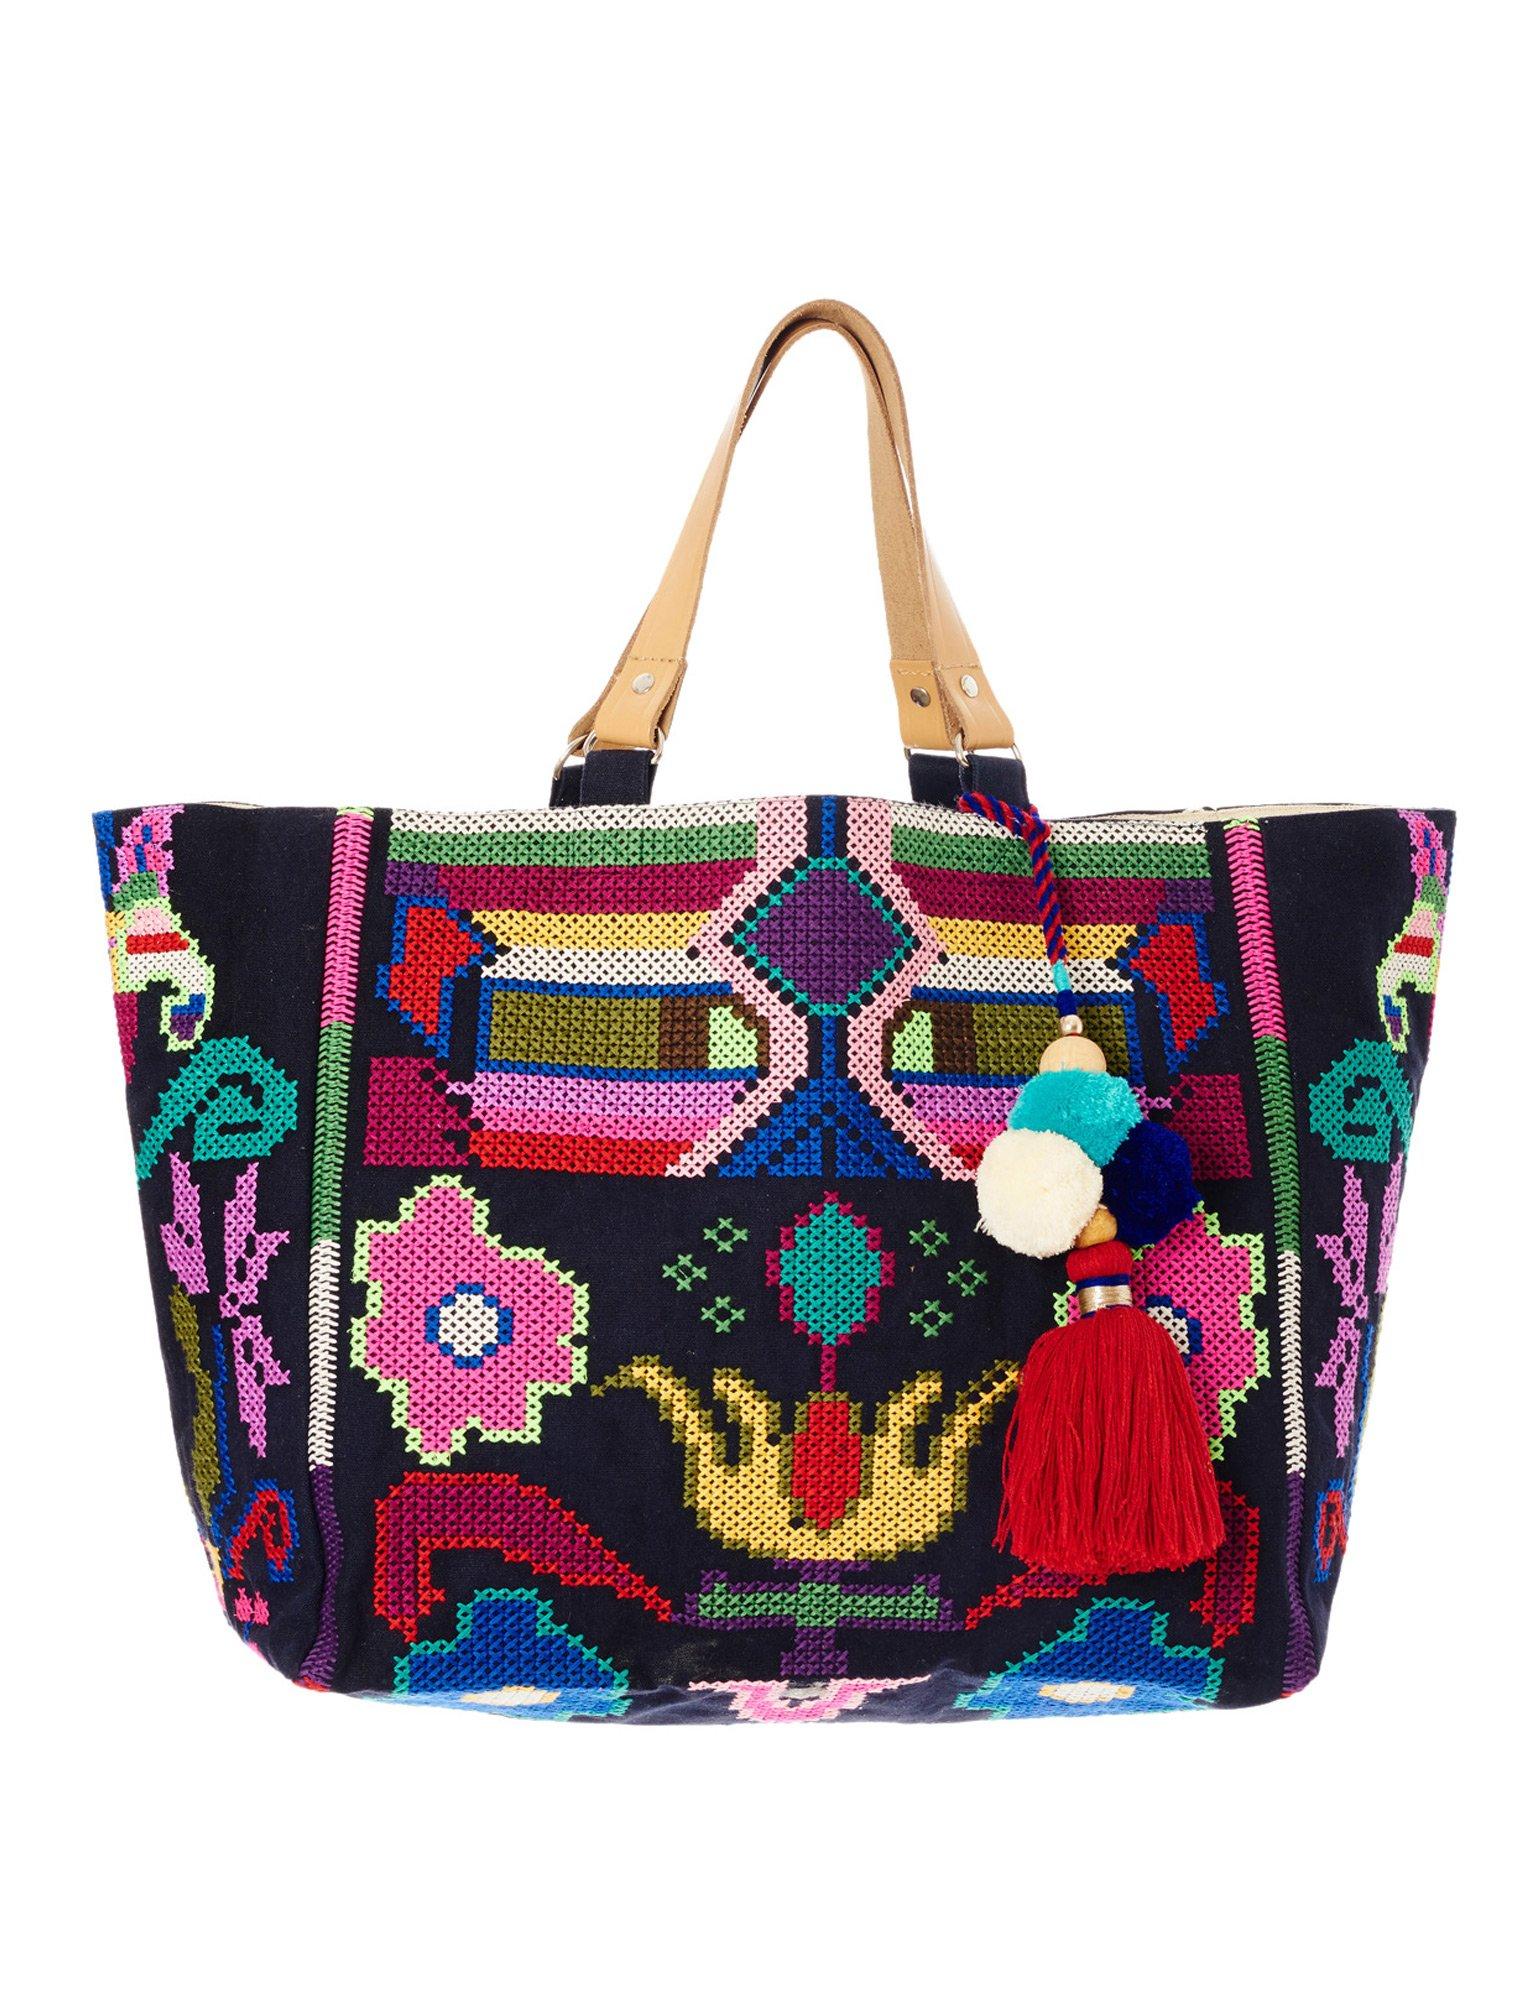 Star Mela Women's Vita Women's Navy Tote Beach Bag 100% Cotton